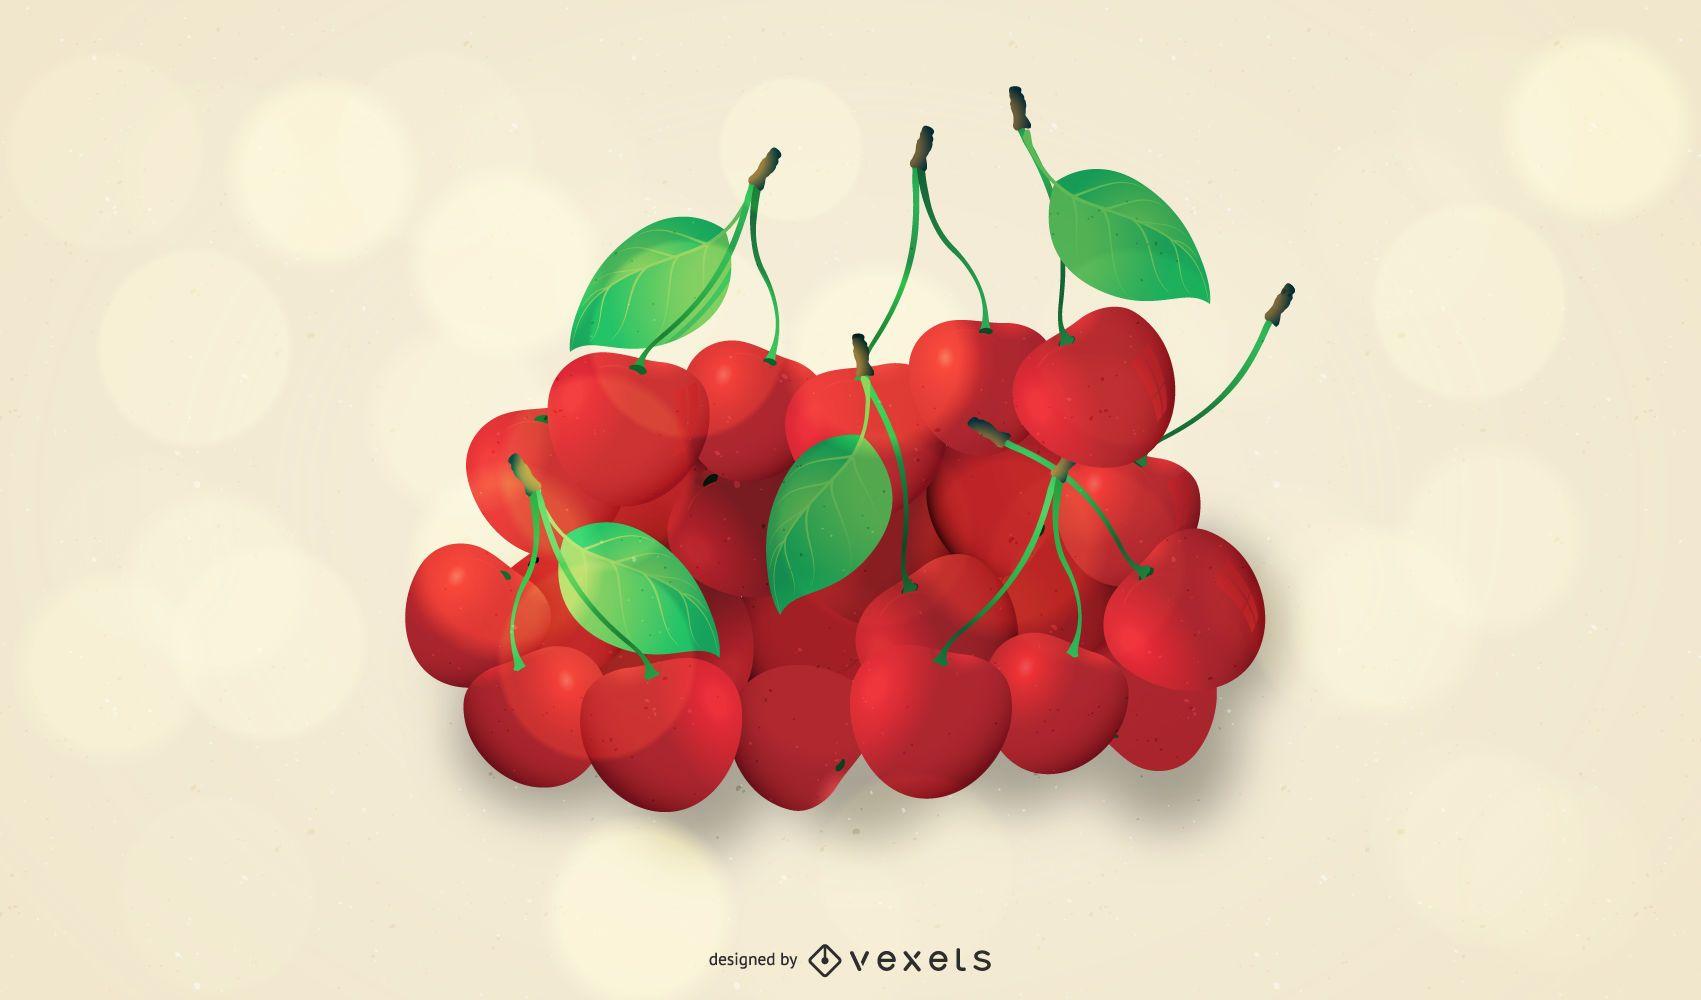 Hill of juicy fresh cherries